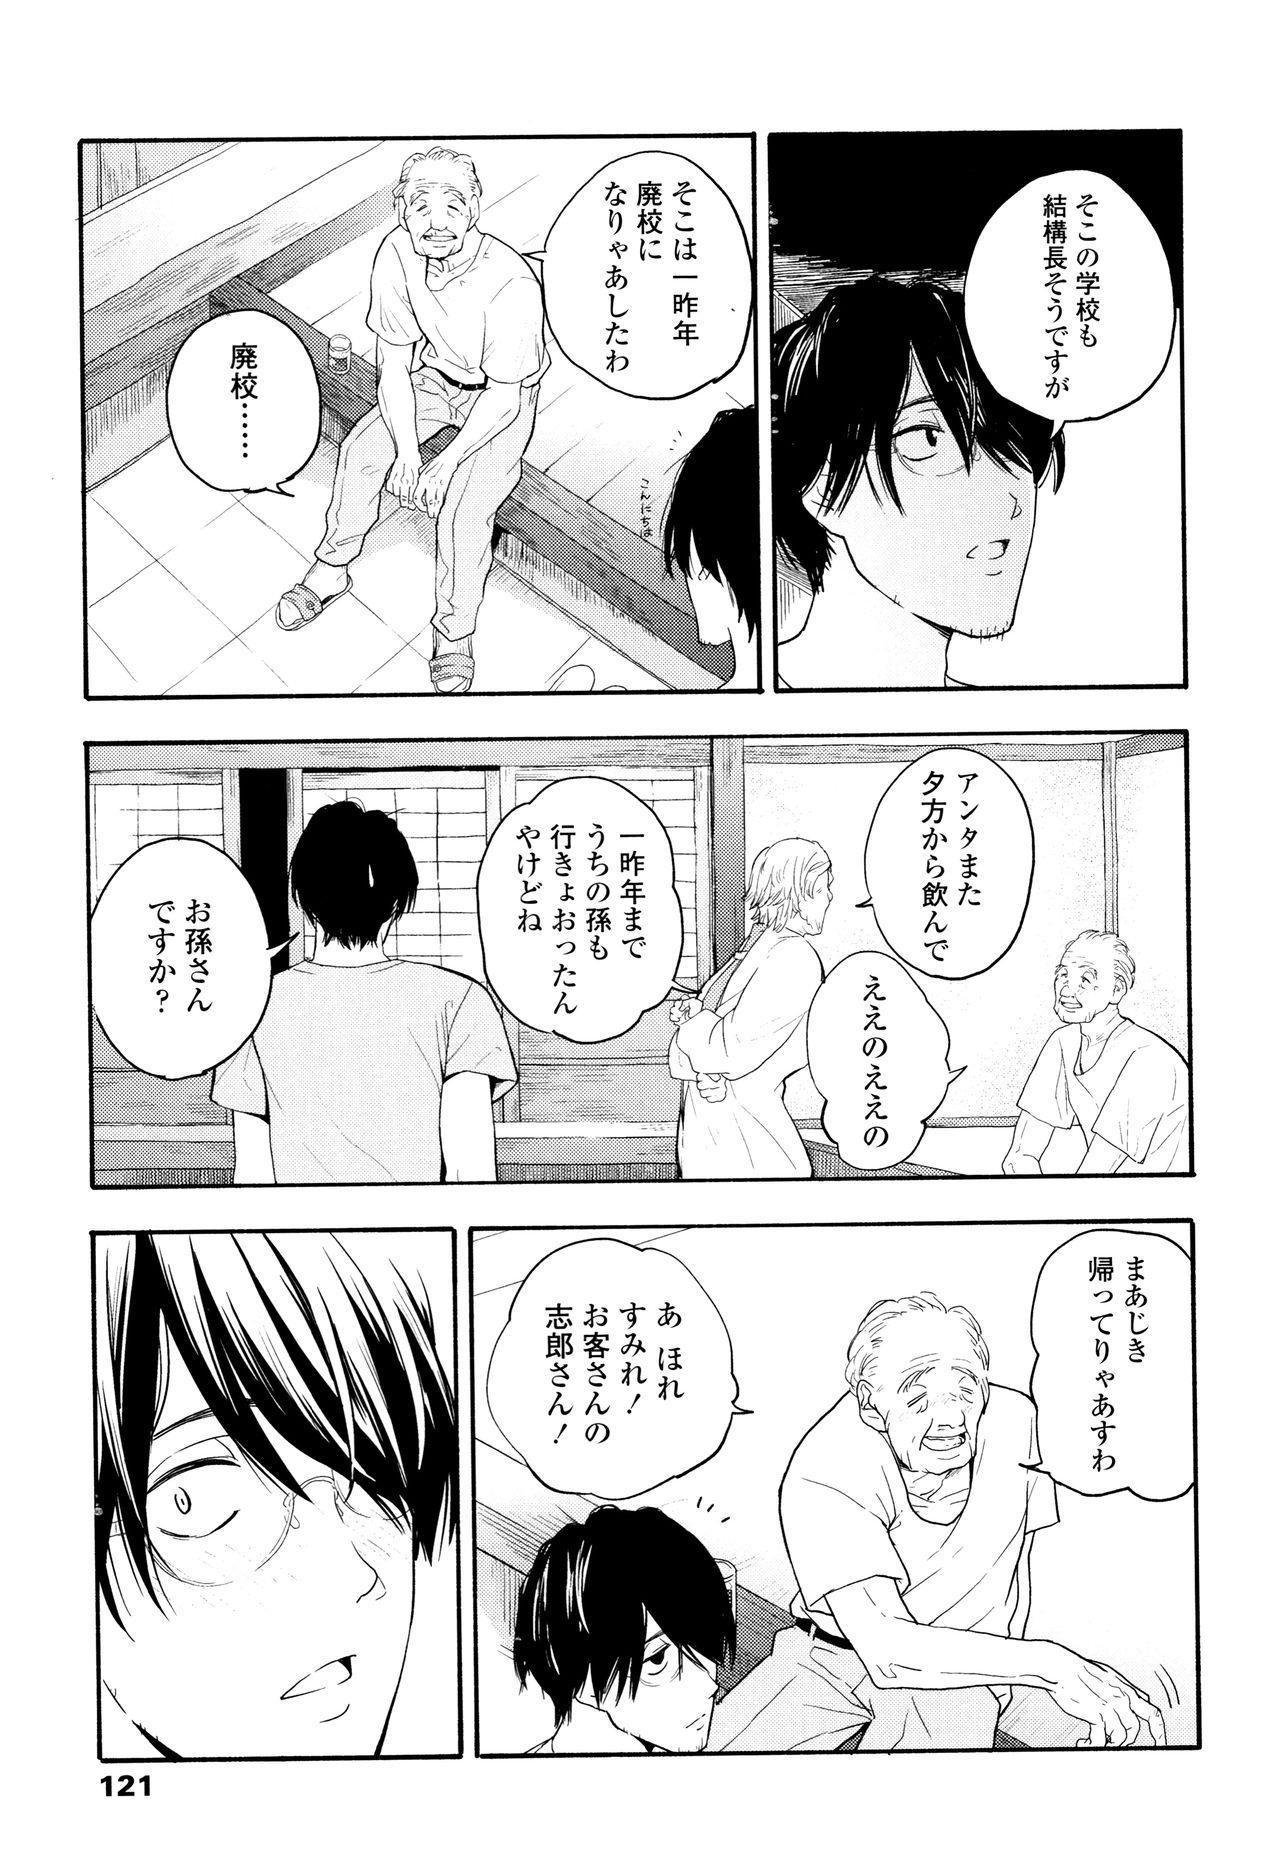 Shishunki no Eros - puberty eros 123